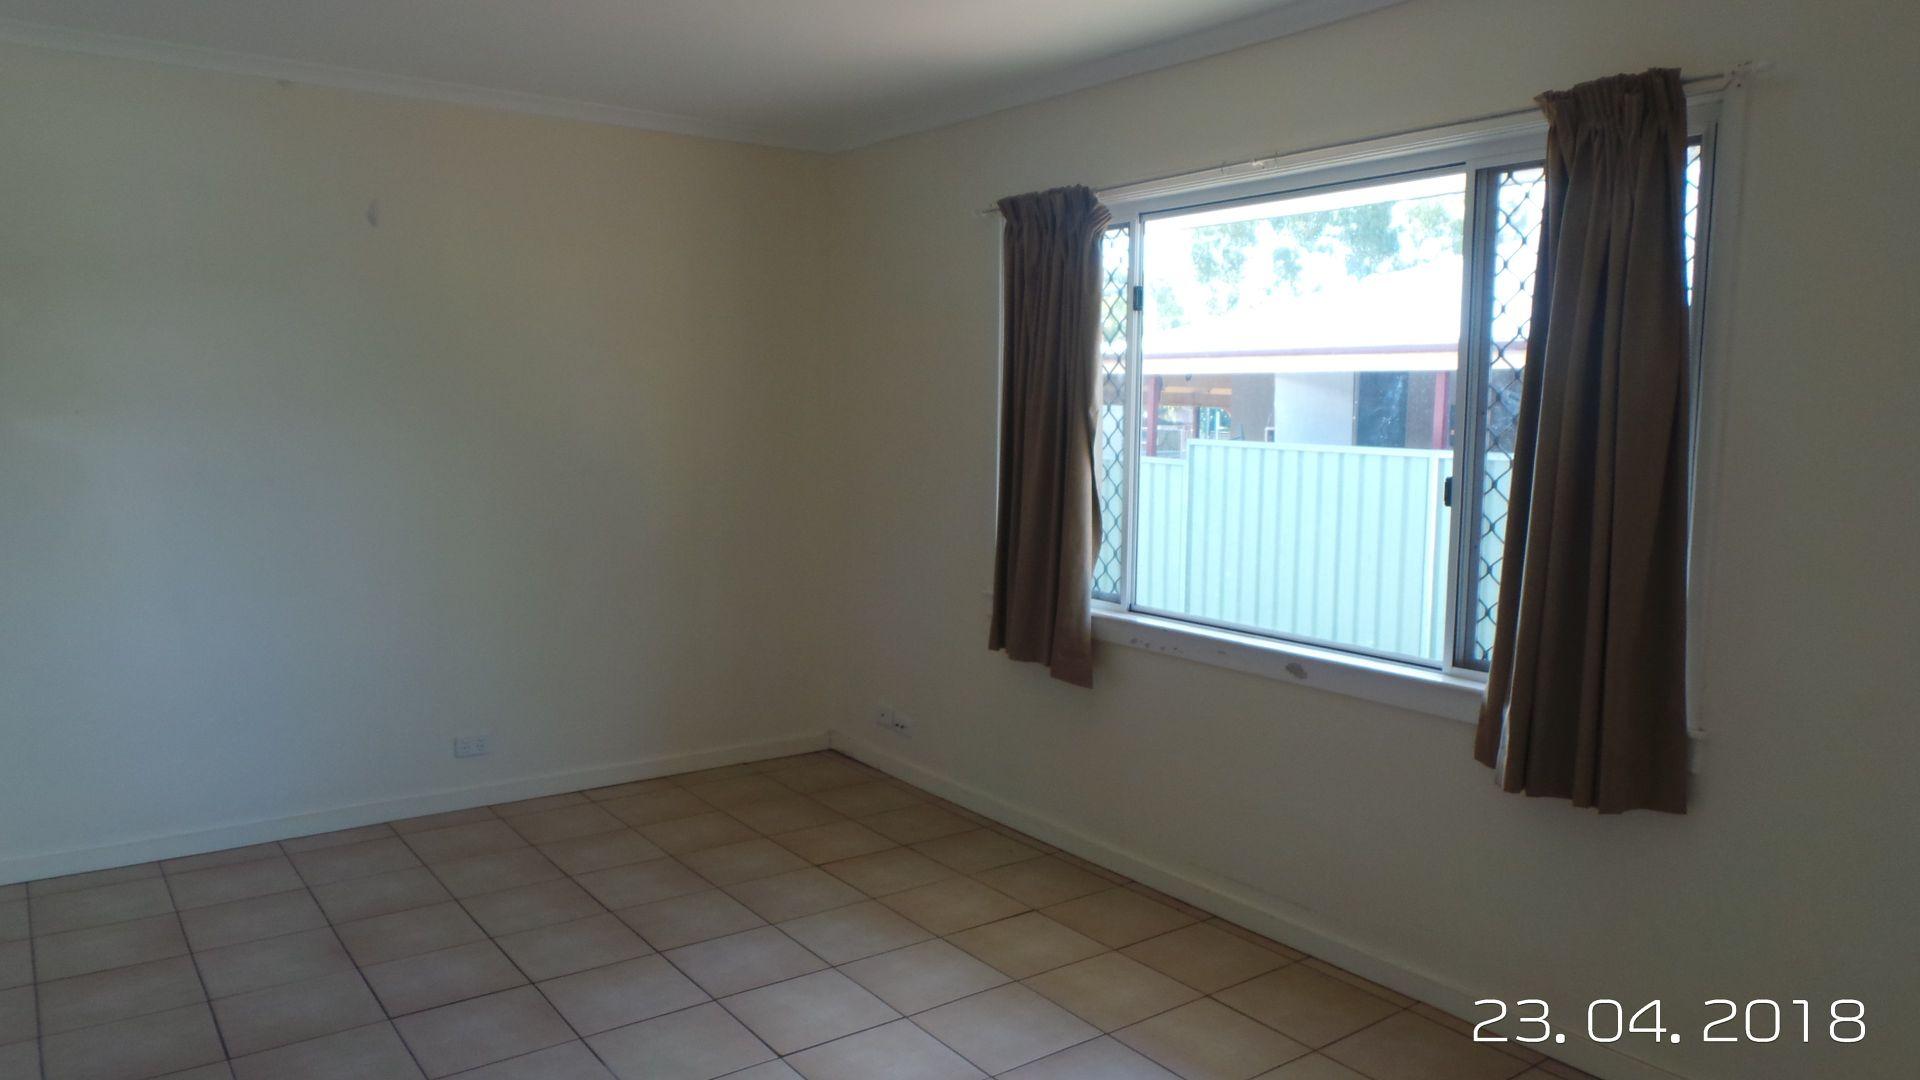 103 Kookaburra Street, Mount Isa QLD 4825, Image 1